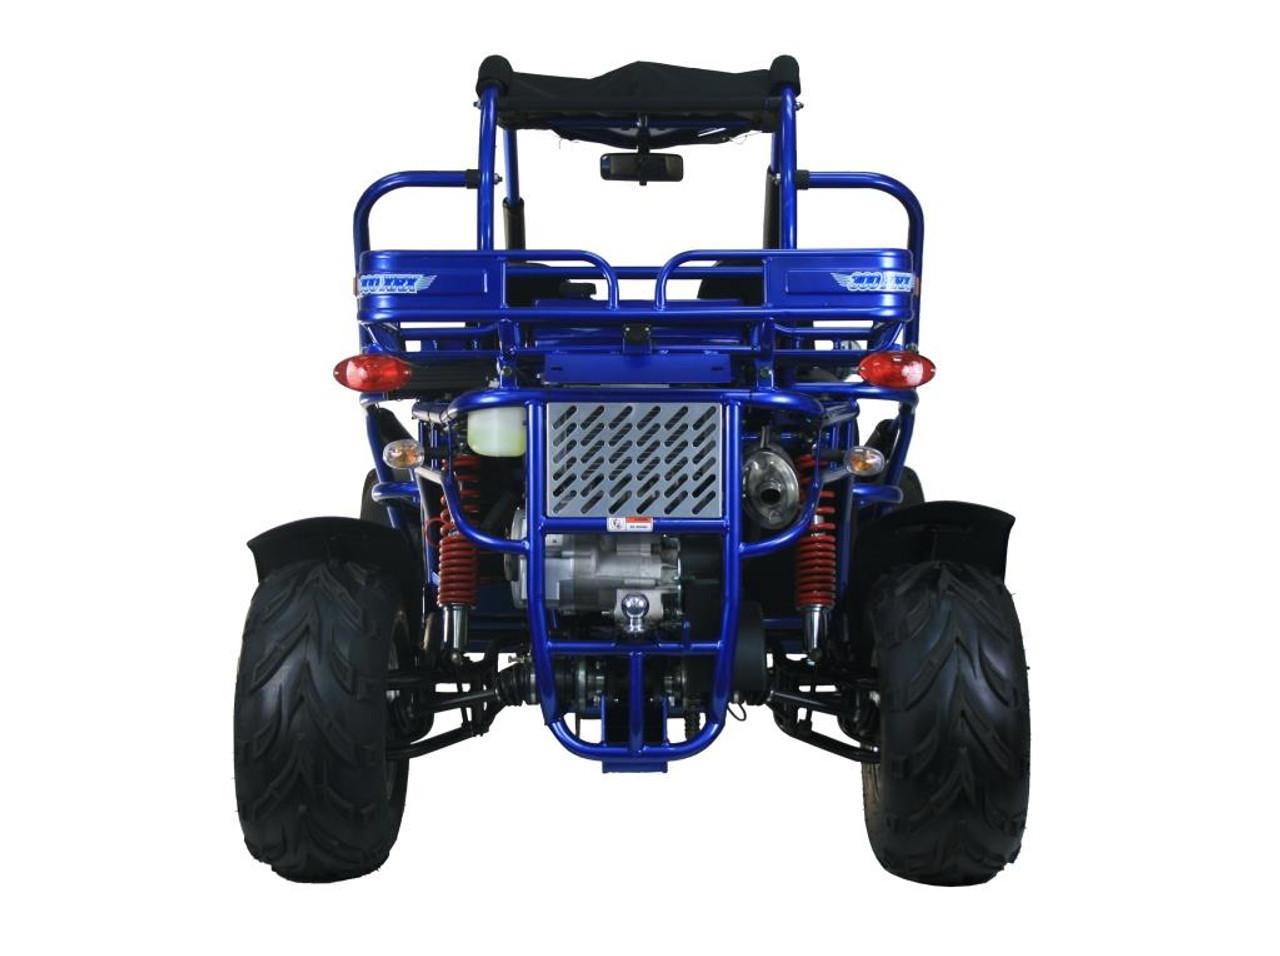 TrailMaster 300 XRX-E Go Kart - Rear